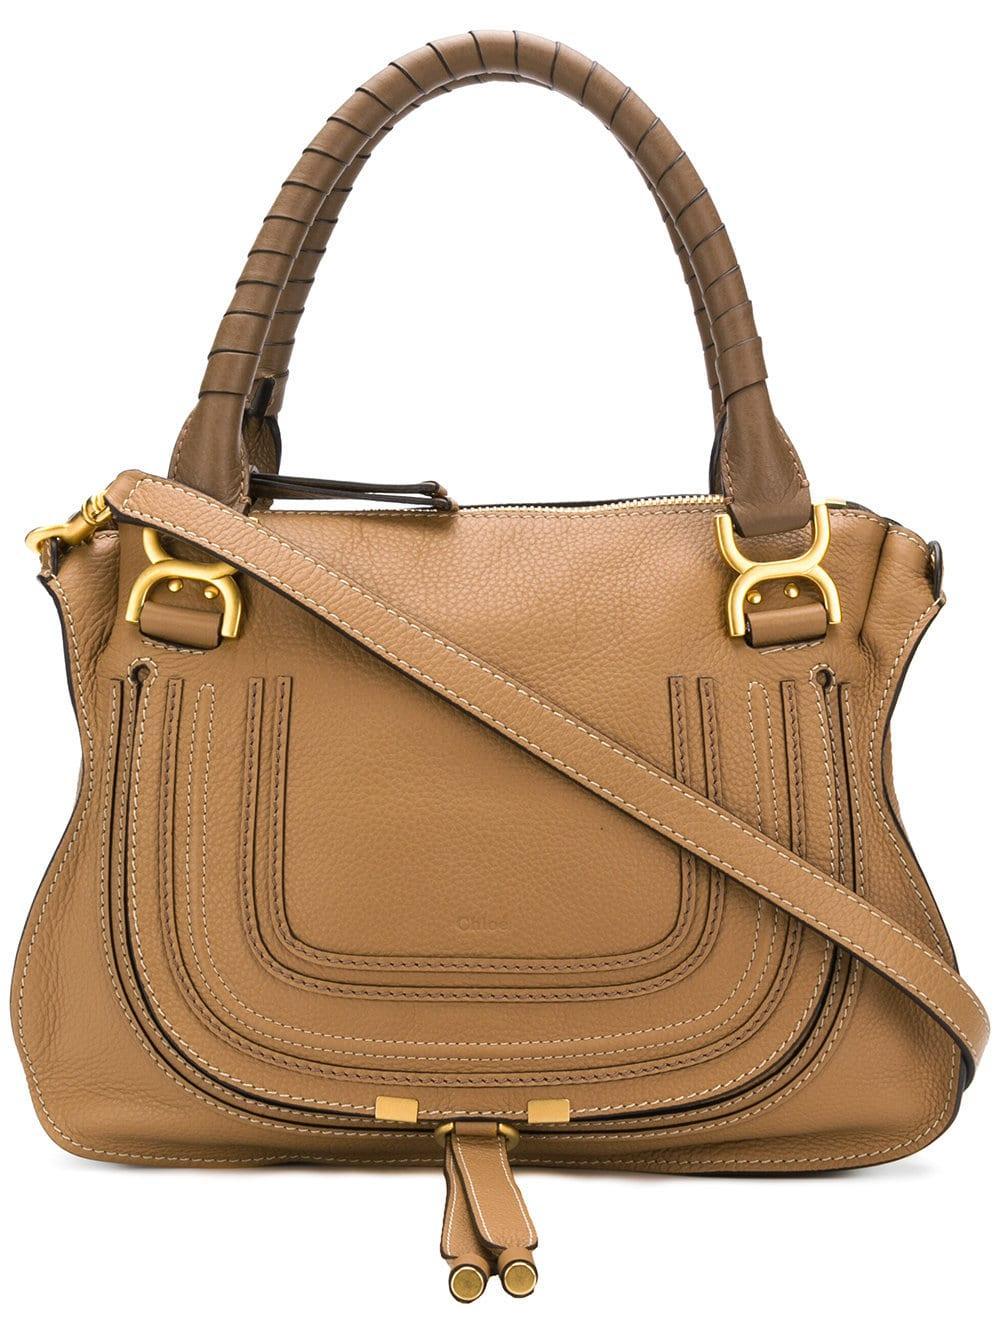 Marcie Med Double Carry Calfskin Bag